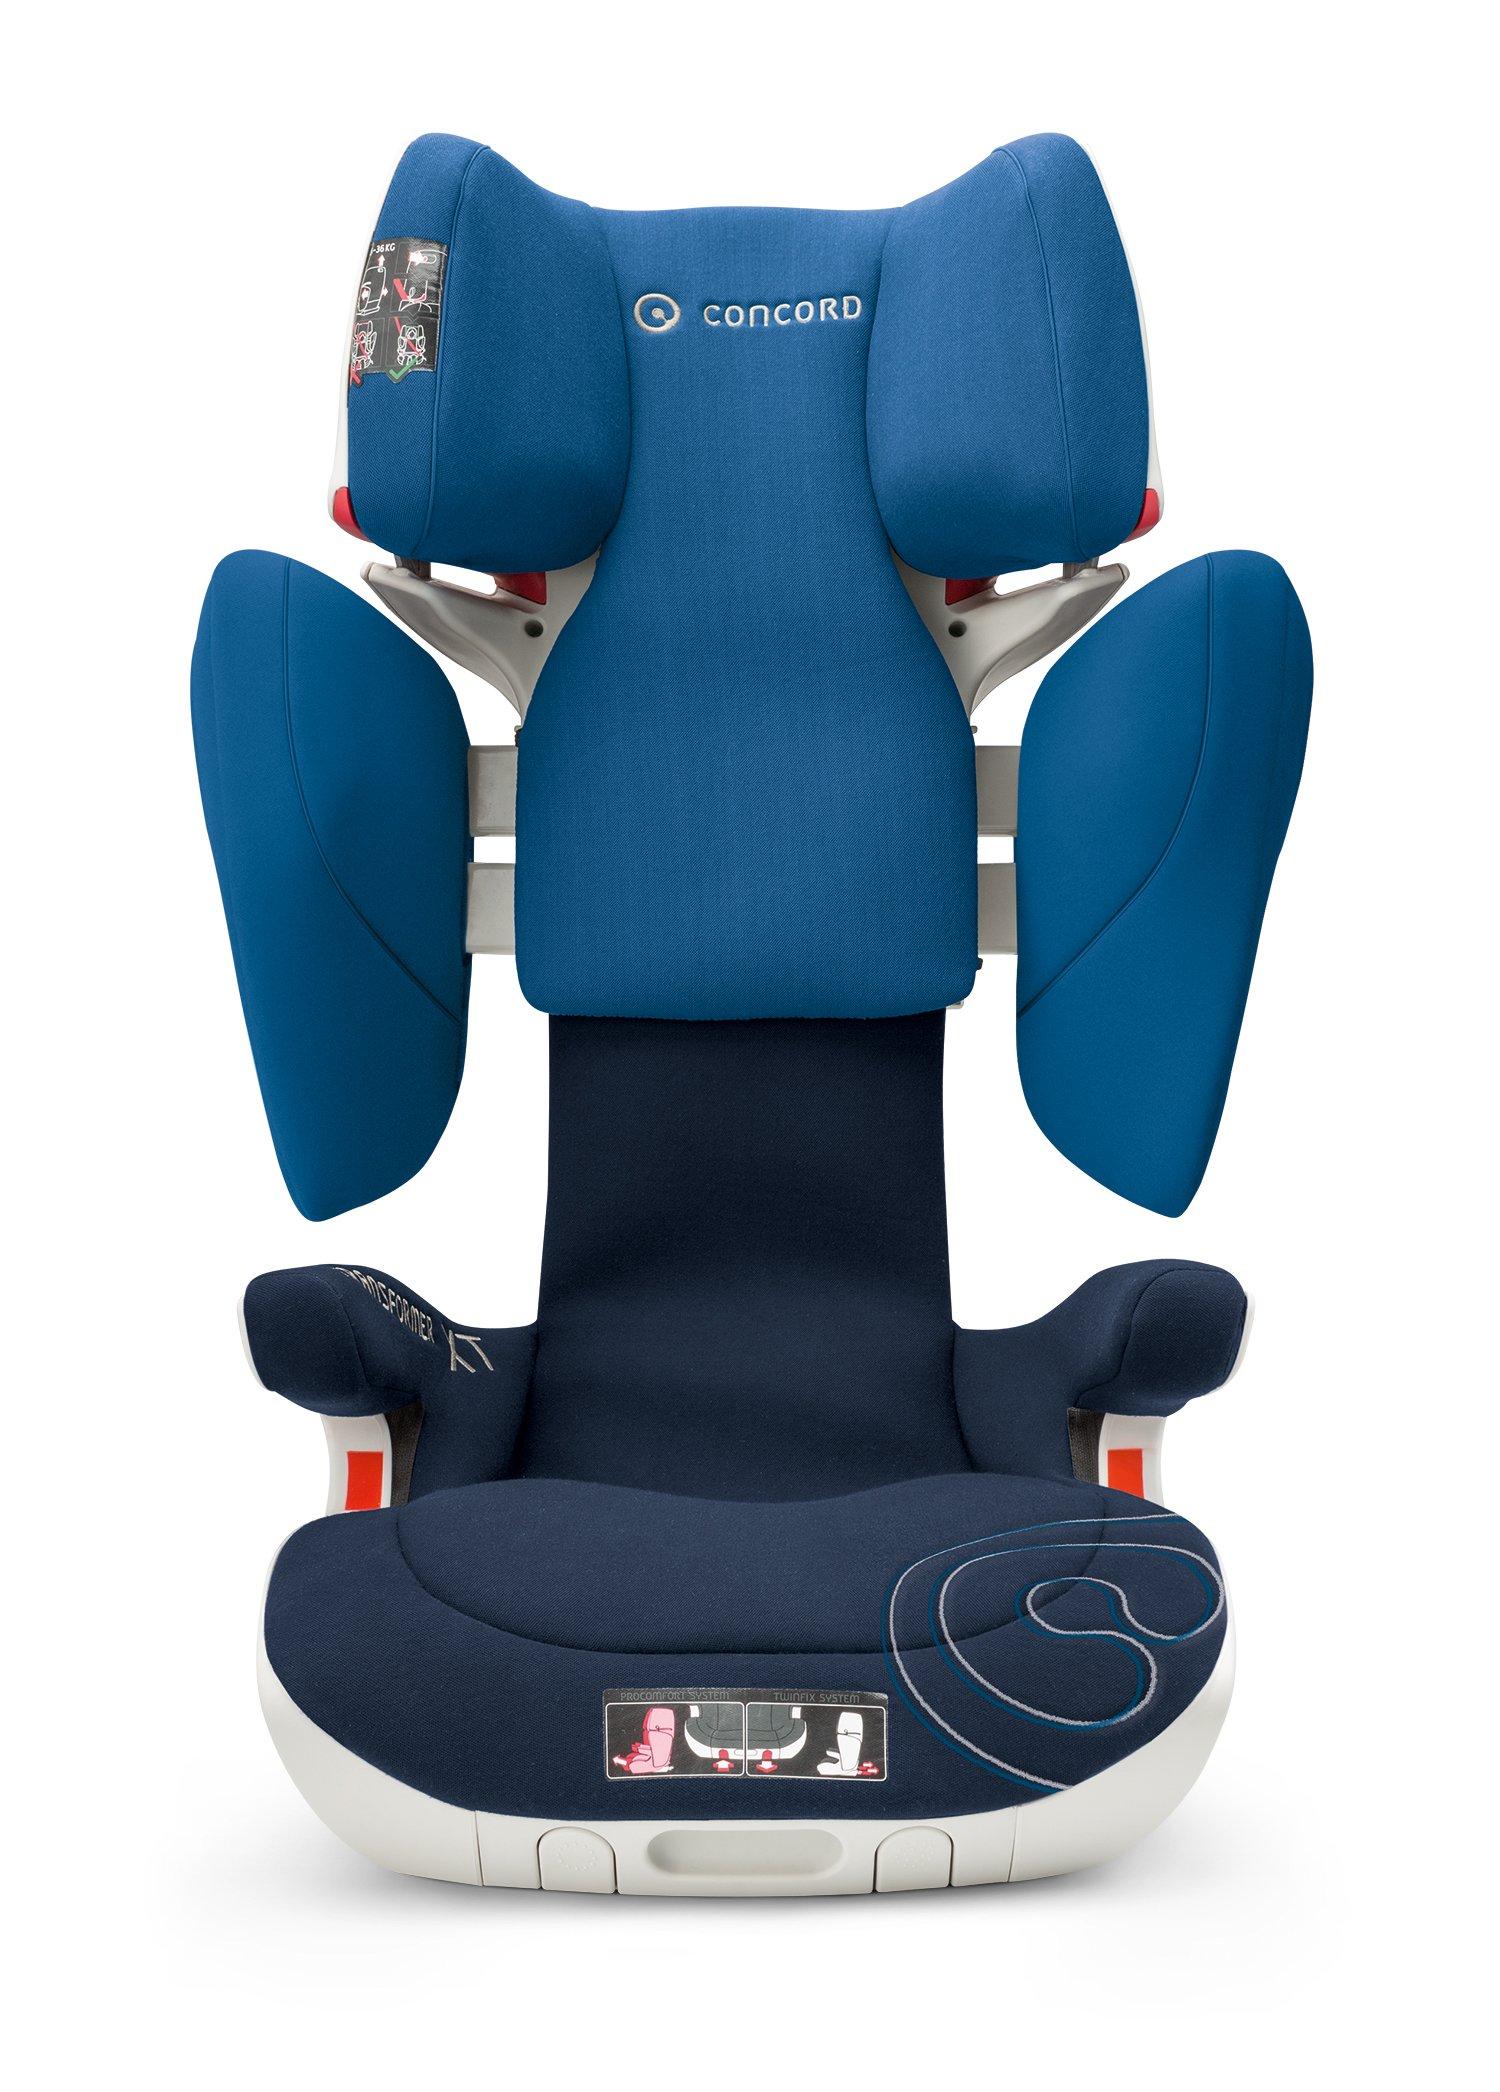 Concord Transfomer Xt (Ocean Blue)